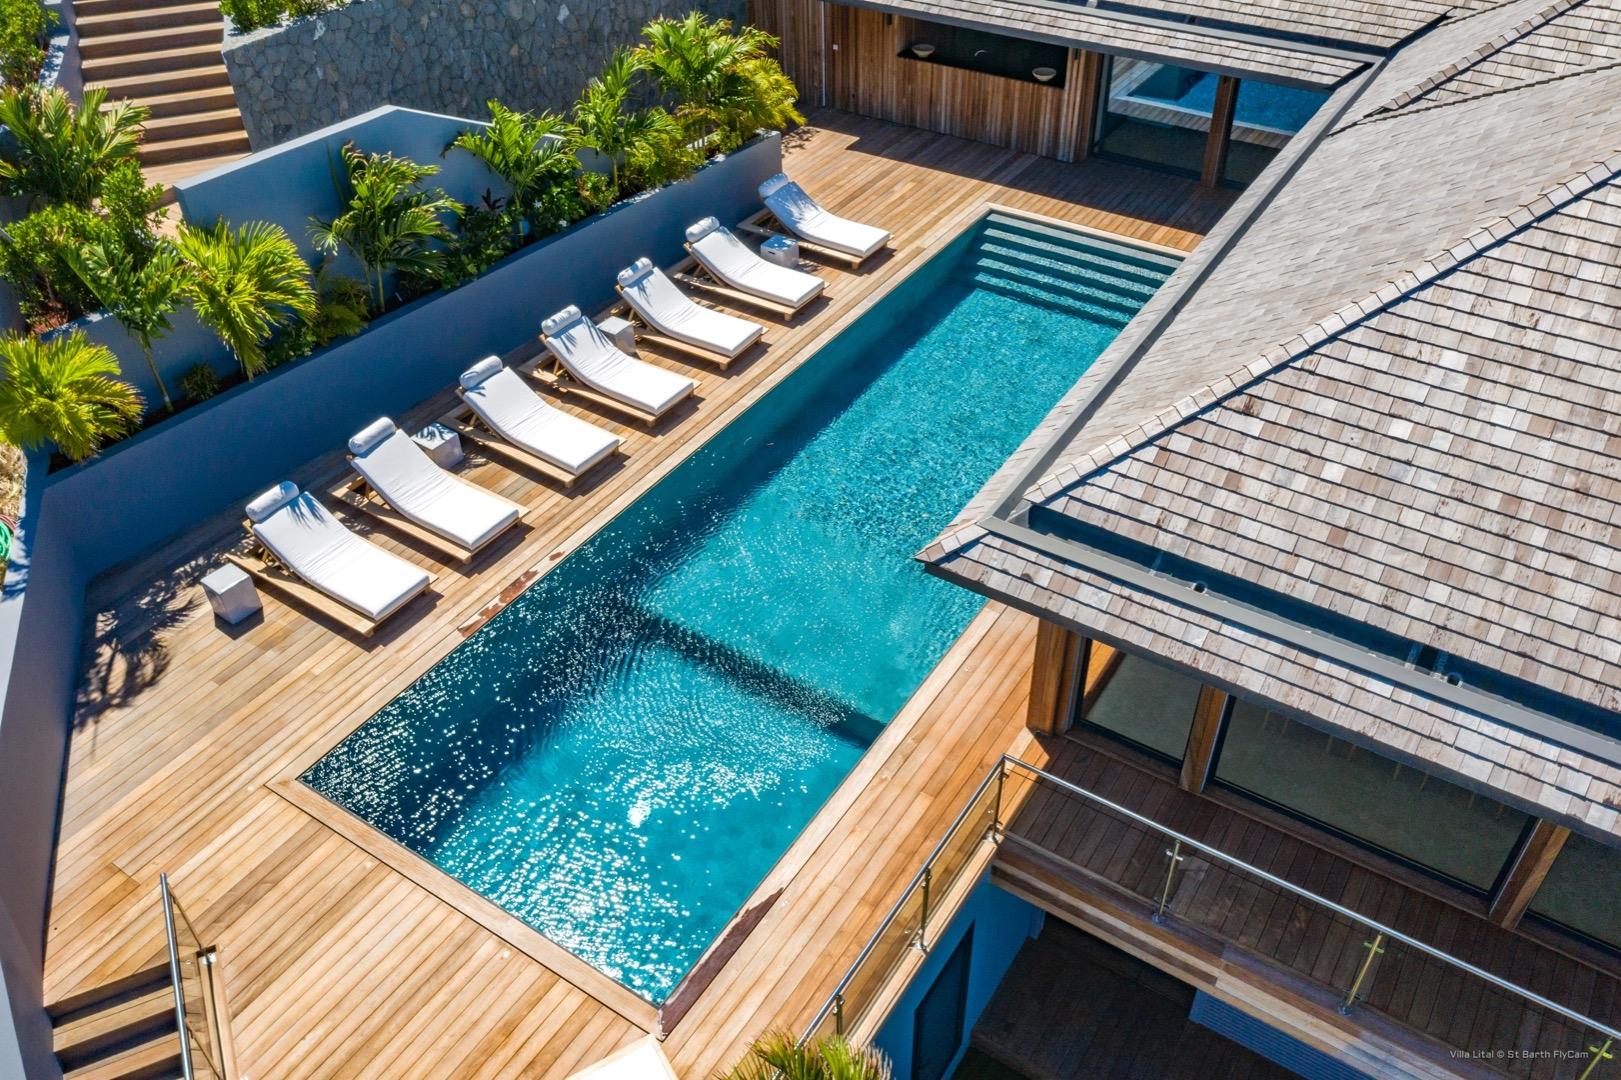 Luxury villa rentals caribbean - St barthelemy - Anse des cayes - No location 4 - Lital - Image 1/61